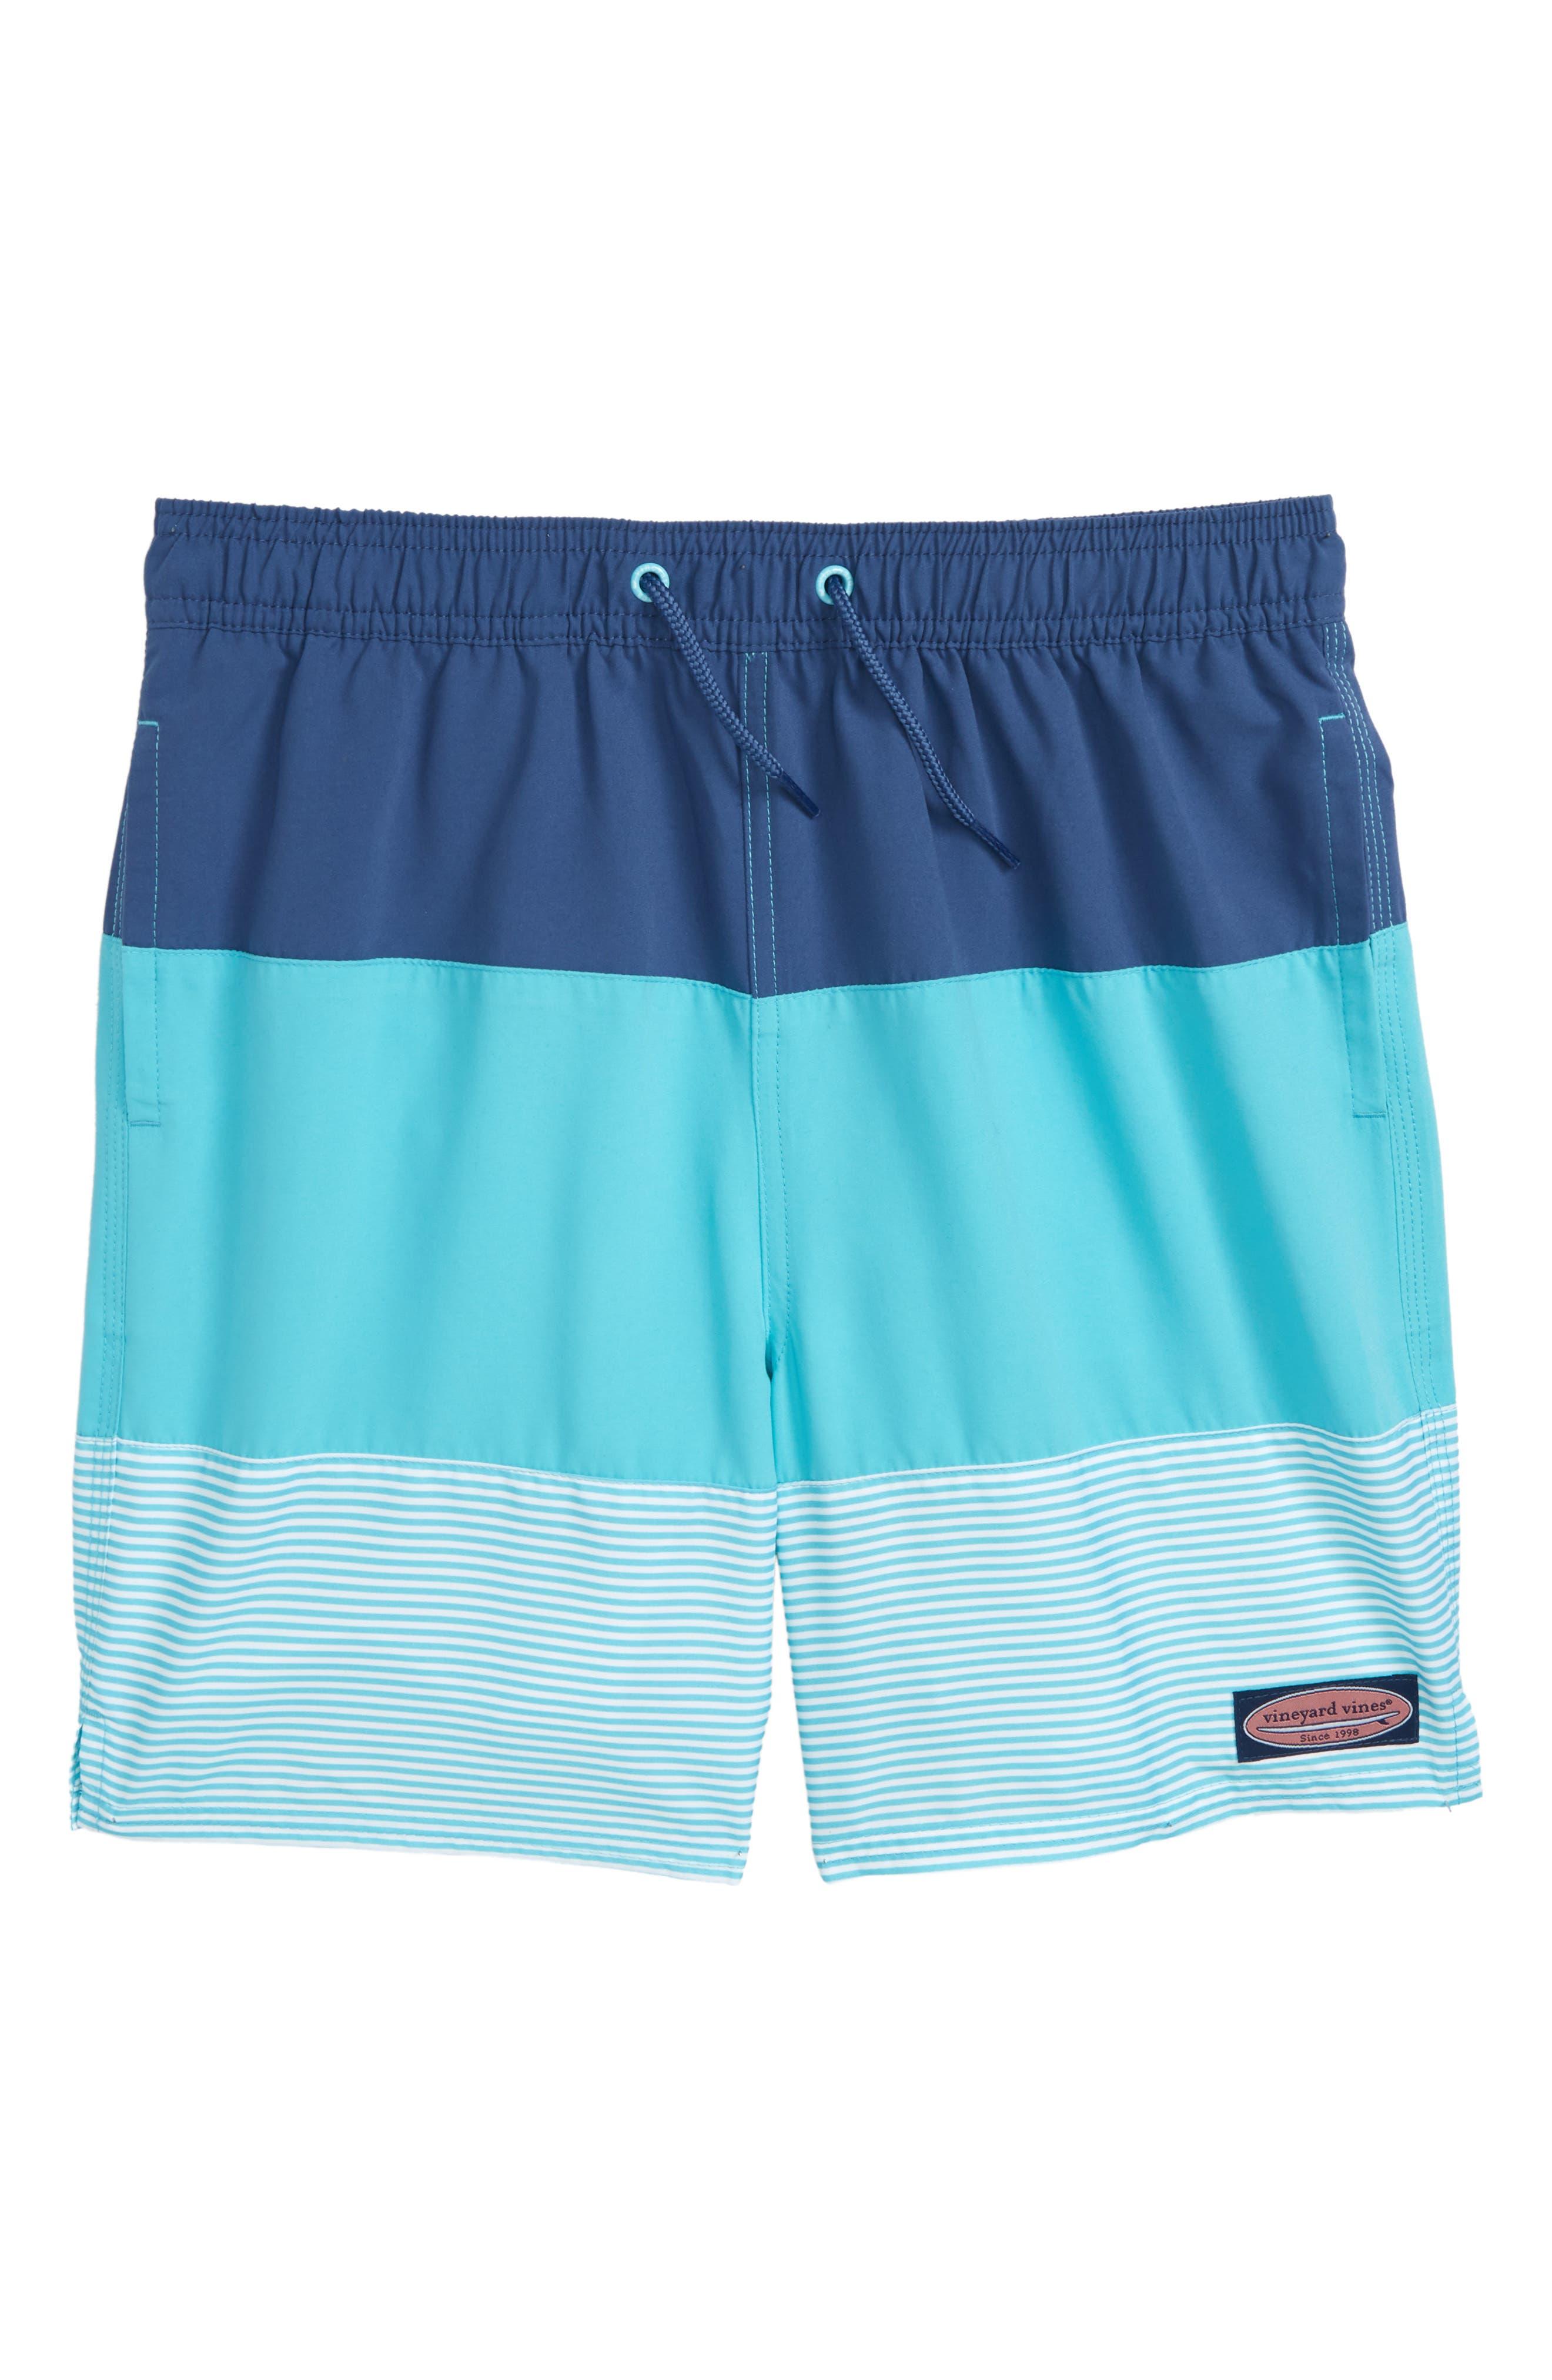 Chappy Pieced Swim Trunks,                         Main,                         color, Turqs